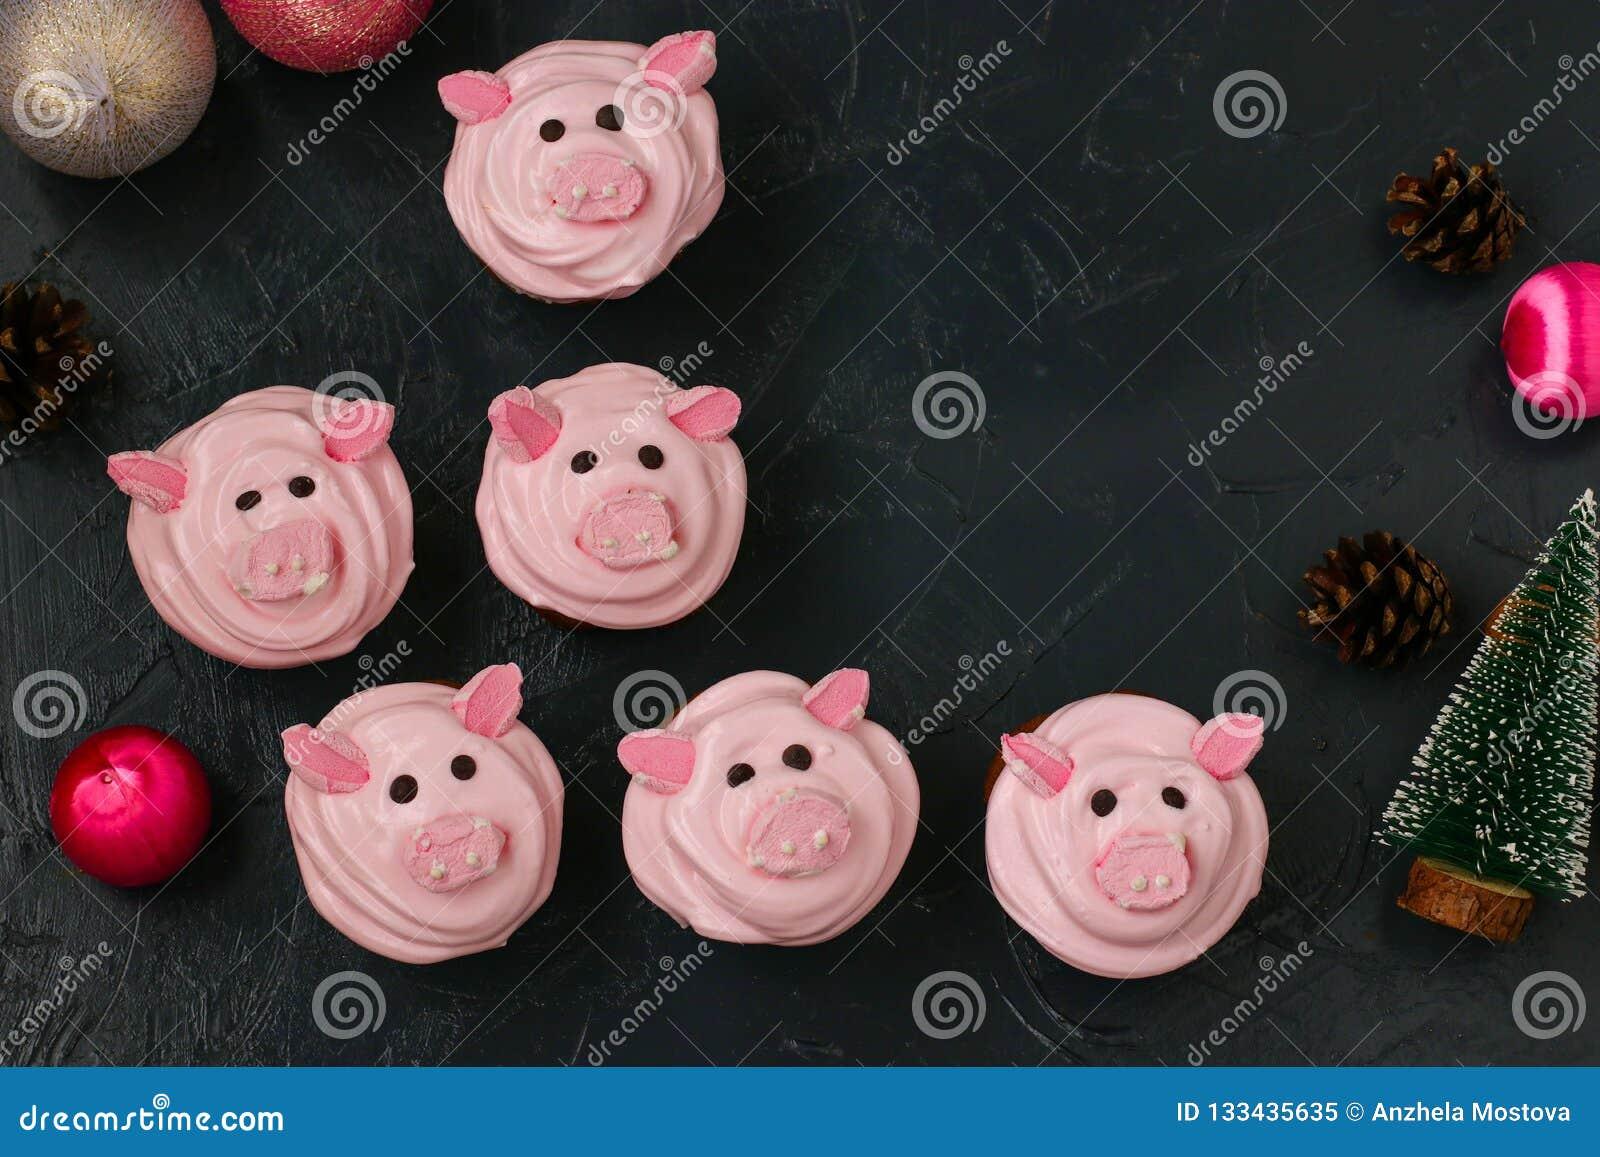 Roze varken cupcakes - eigengemaakte die cupcakes met eiwitroom en heemst wordt verfraaid gaven grappige piggies gestalte